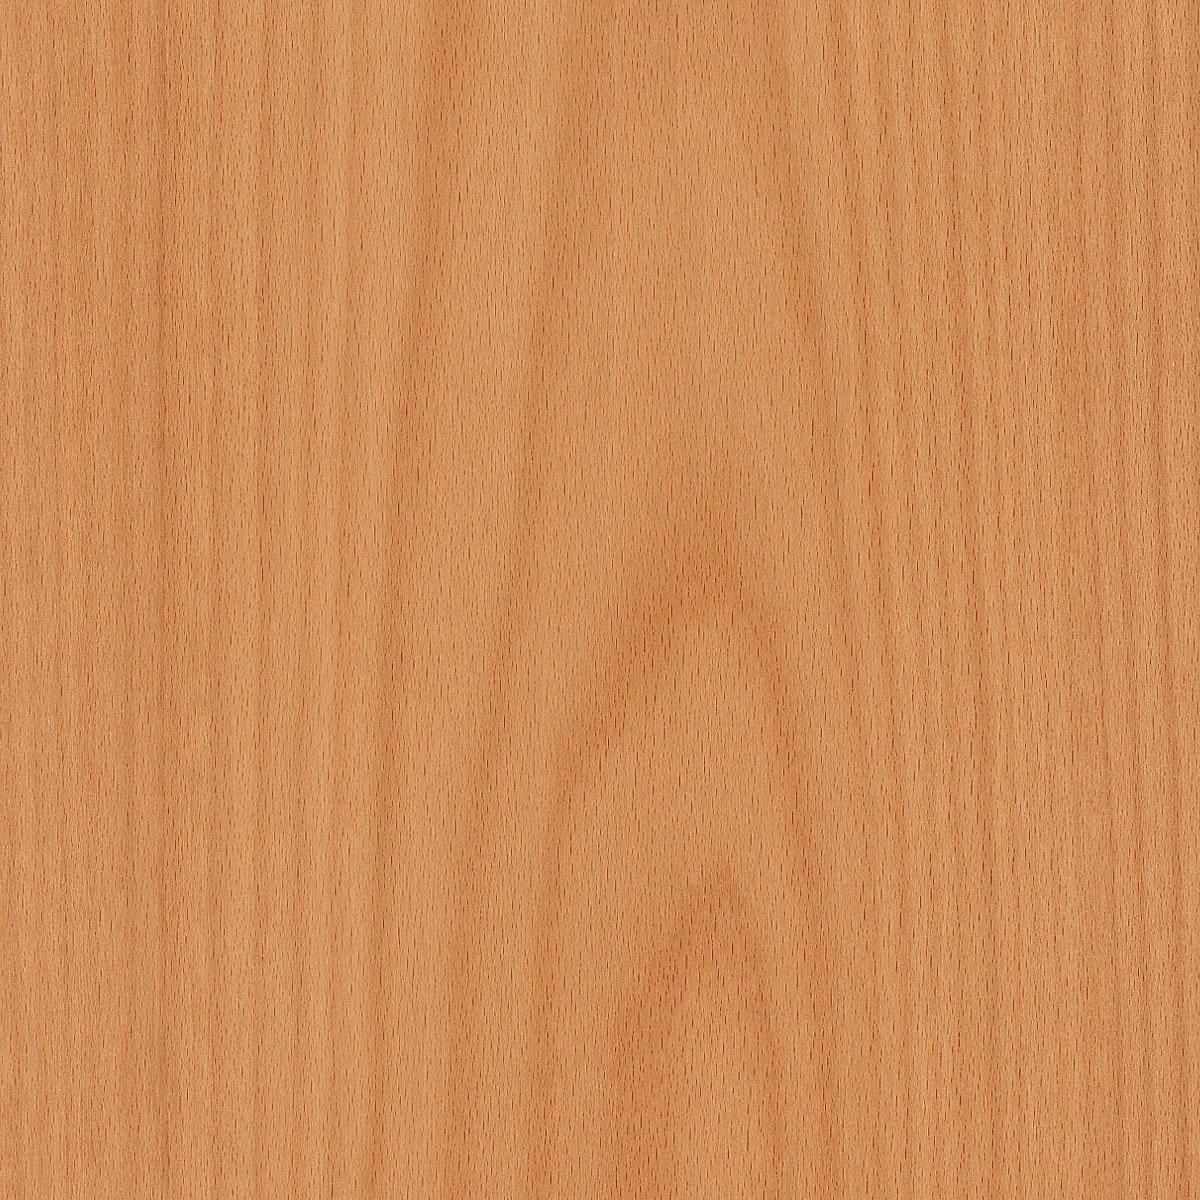 Beech Wood Veneer Plain Sliced 4'x8' 2 Ply(Wood) PSA (Peel and Stick) Sheet Wood-All CECOMINOD094492